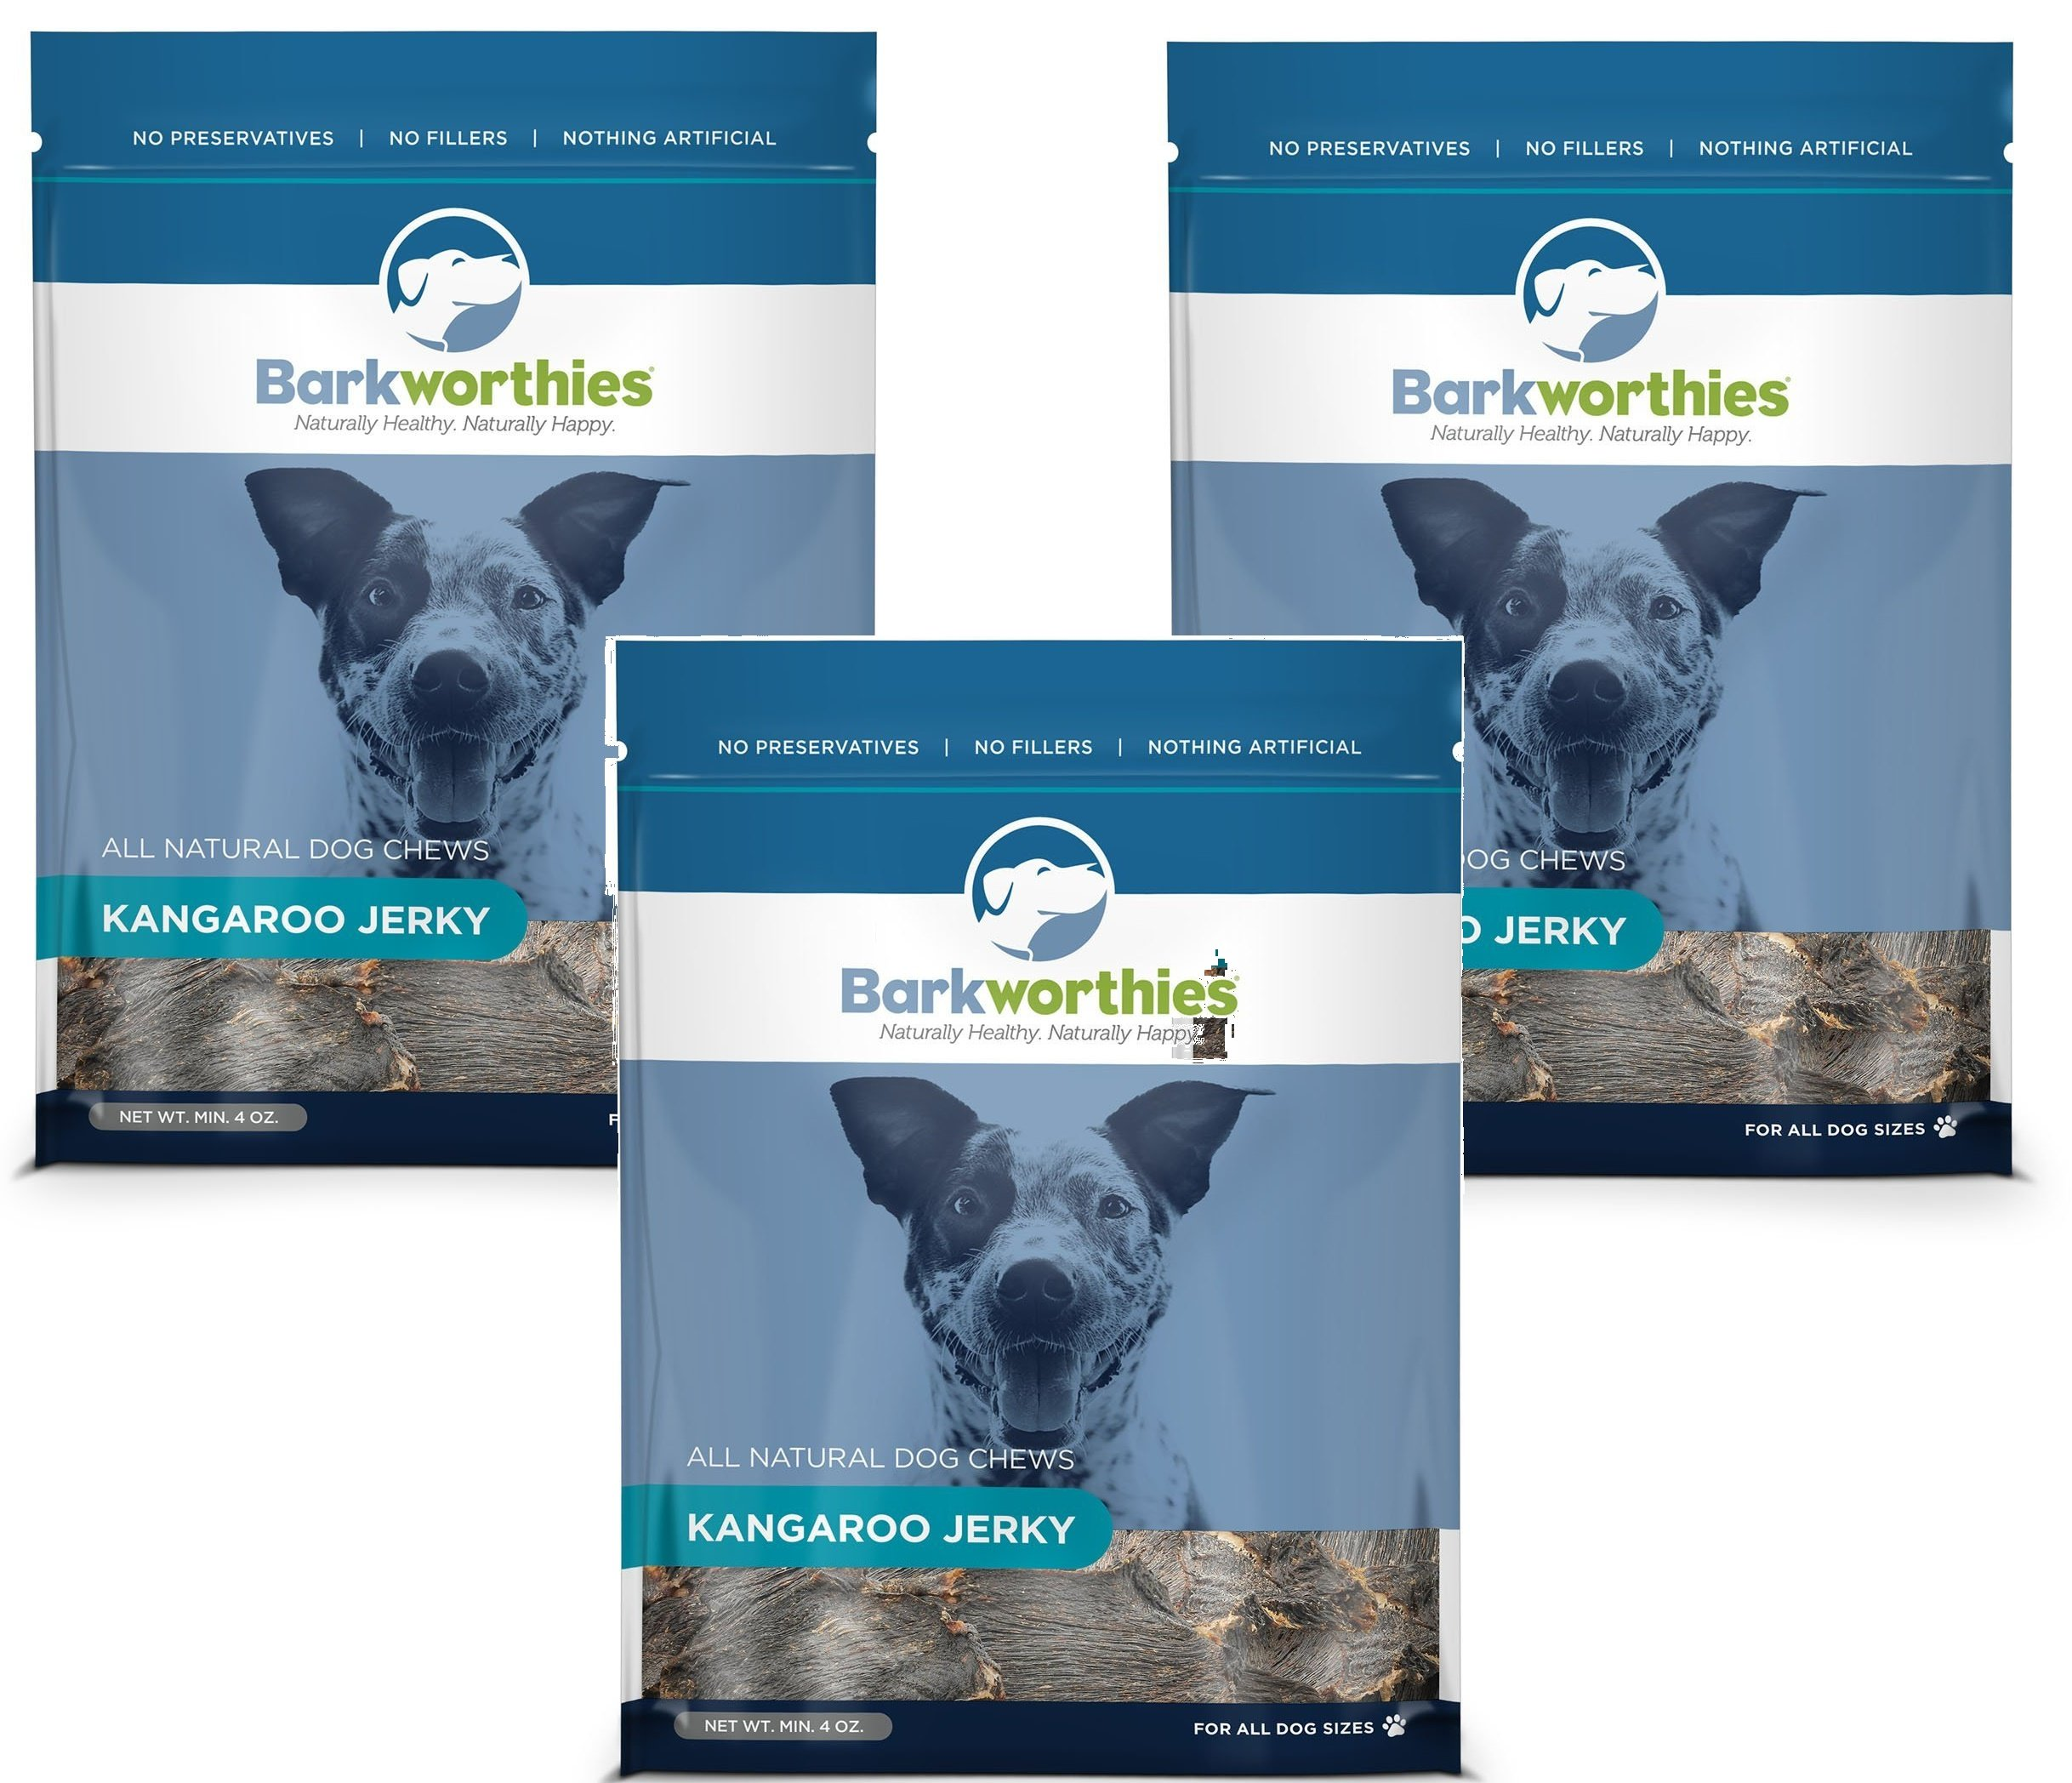 Best Bully Sticks (3 Pack) Barkworthies All Natural Kangaroo Jerky Dog Chews - 4 Ounces Each by Best Bully Sticks